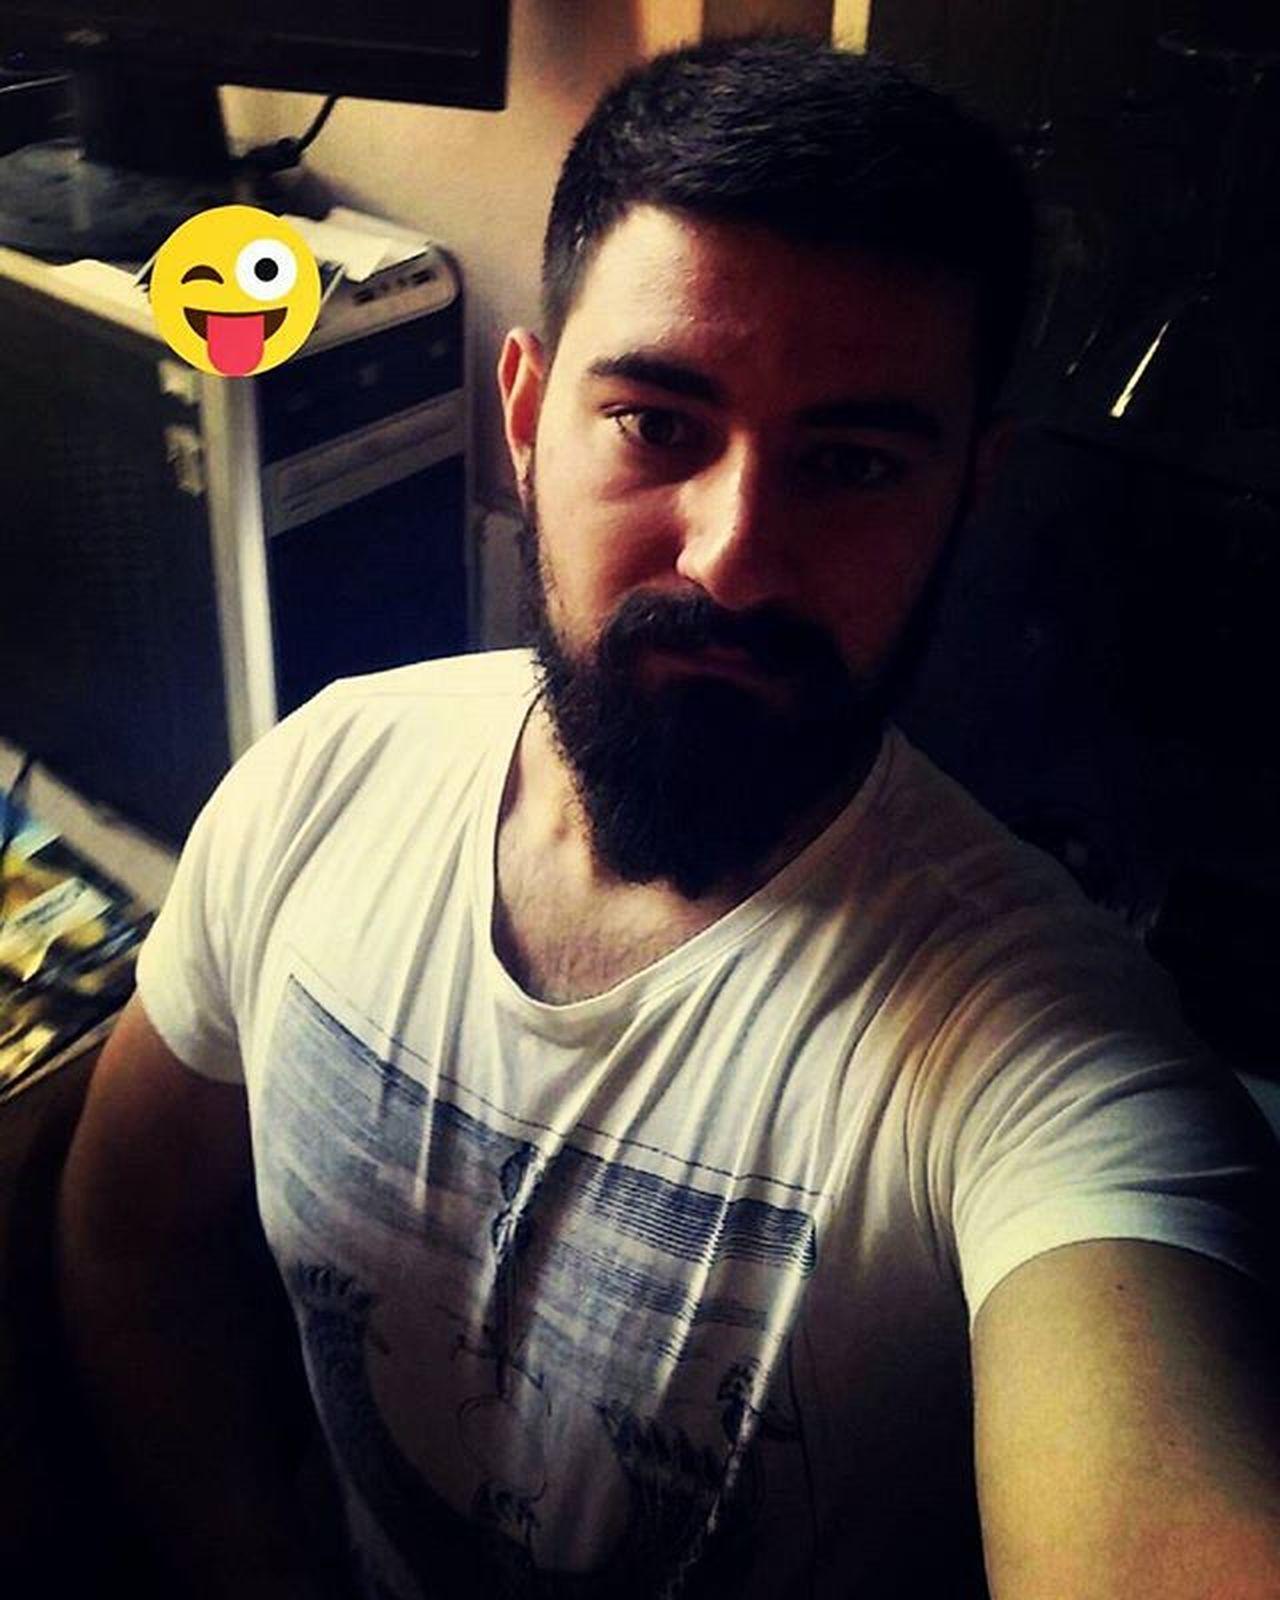 Selam Canısı Me Taking Photos Selfie Tattoo Eye Em Turkey Today's Hot Look Popular Photos Handsome Snapchat Photography Follow Amazing Crazy Boy  EyeEm Best Shots That's Me Follow My Instagram 😎😄😉